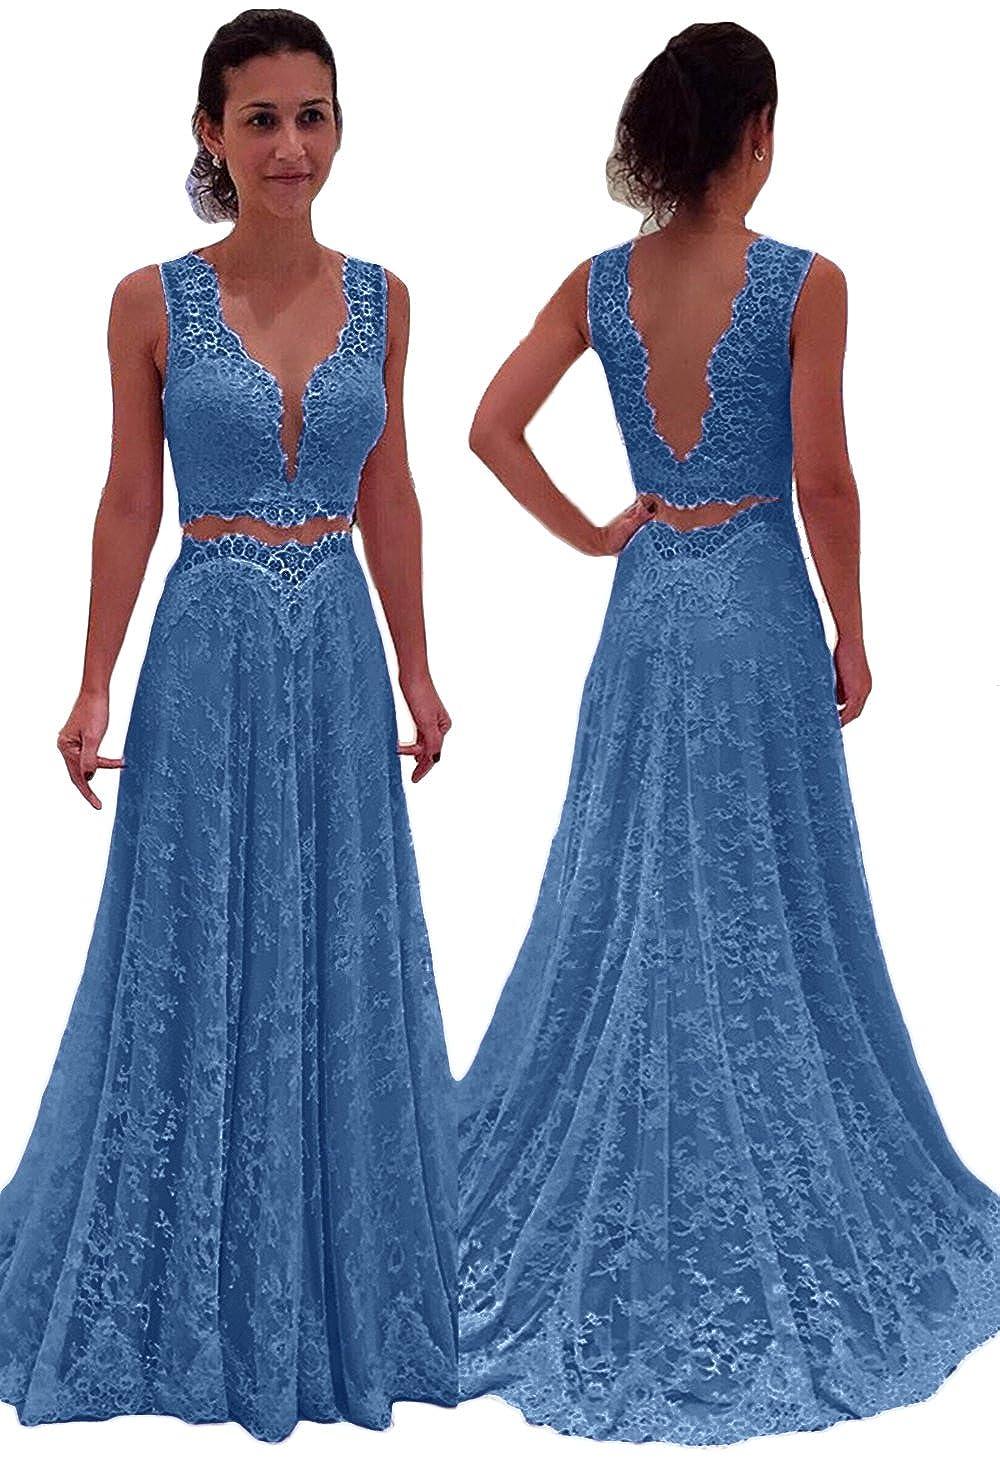 bluee SDRESS Women's Double V Neck 2 Piece Outfits Lace Evening Party Dress Long Prom Dress